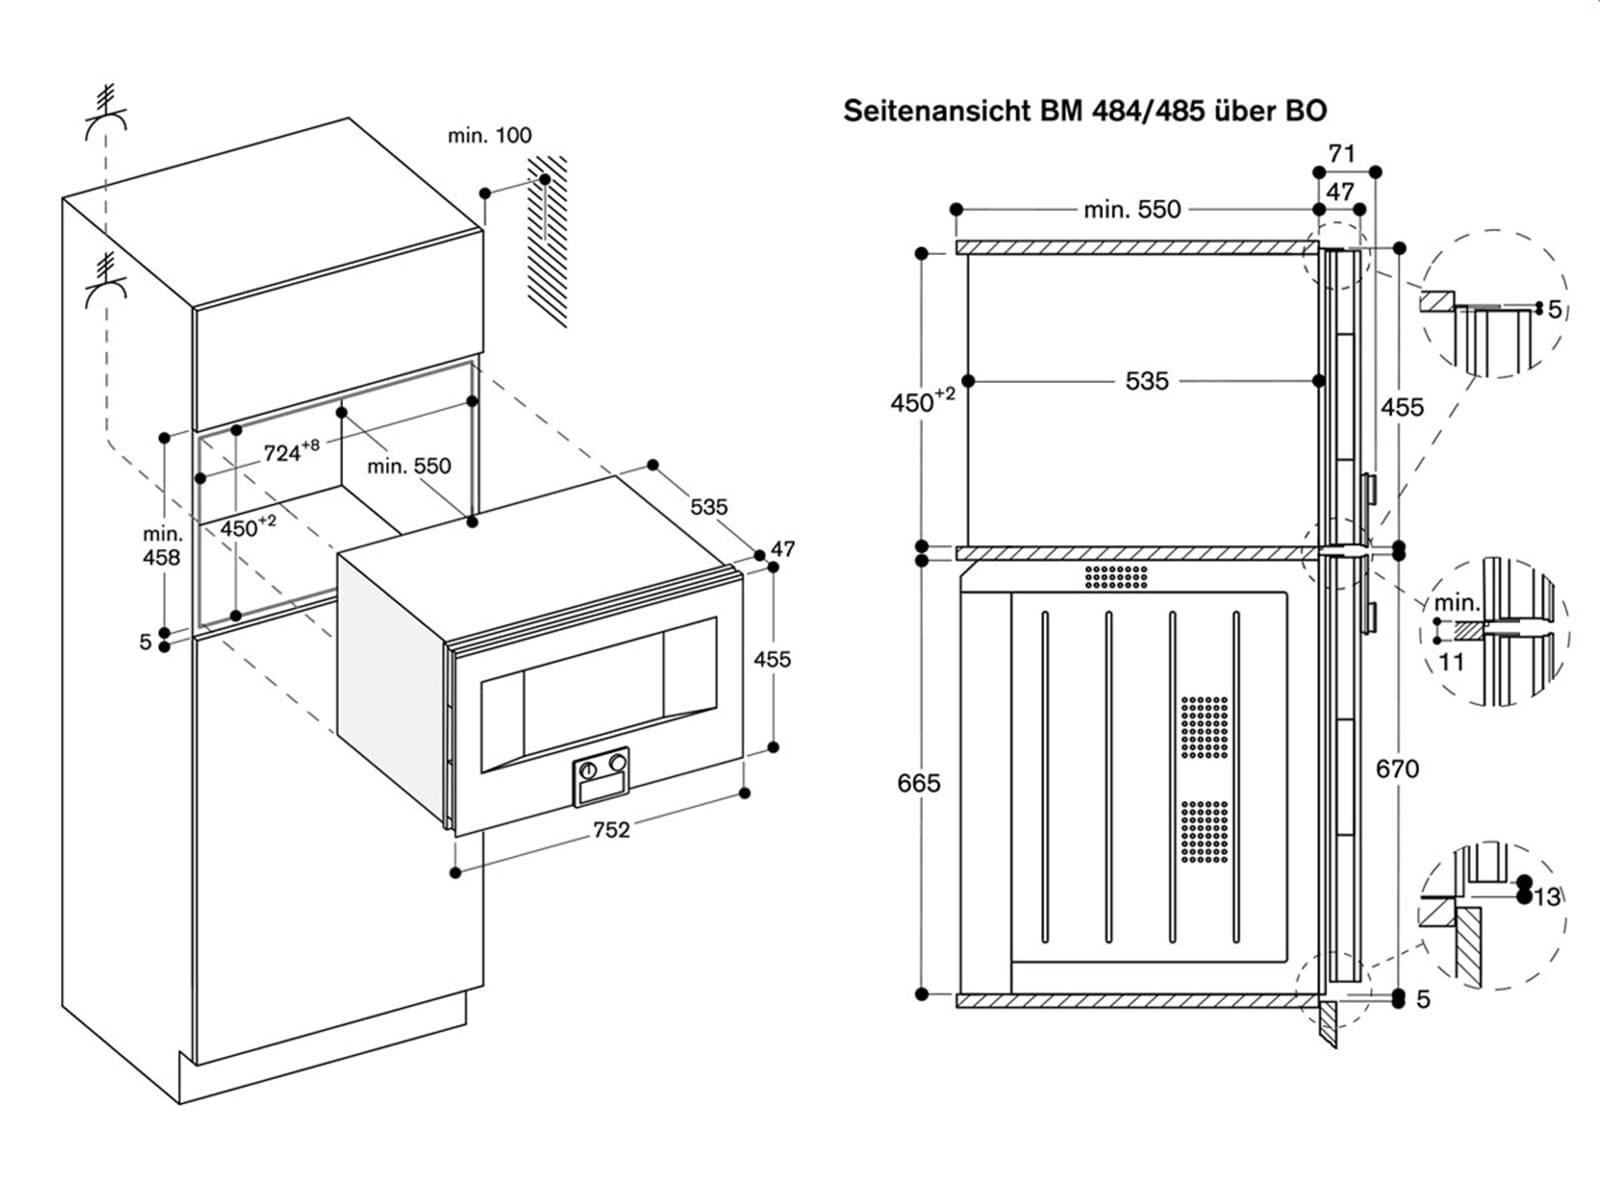 Gaggenau BM 484 110 Mikrowellen-Backofen Serie 400 Edelstahl/Glas